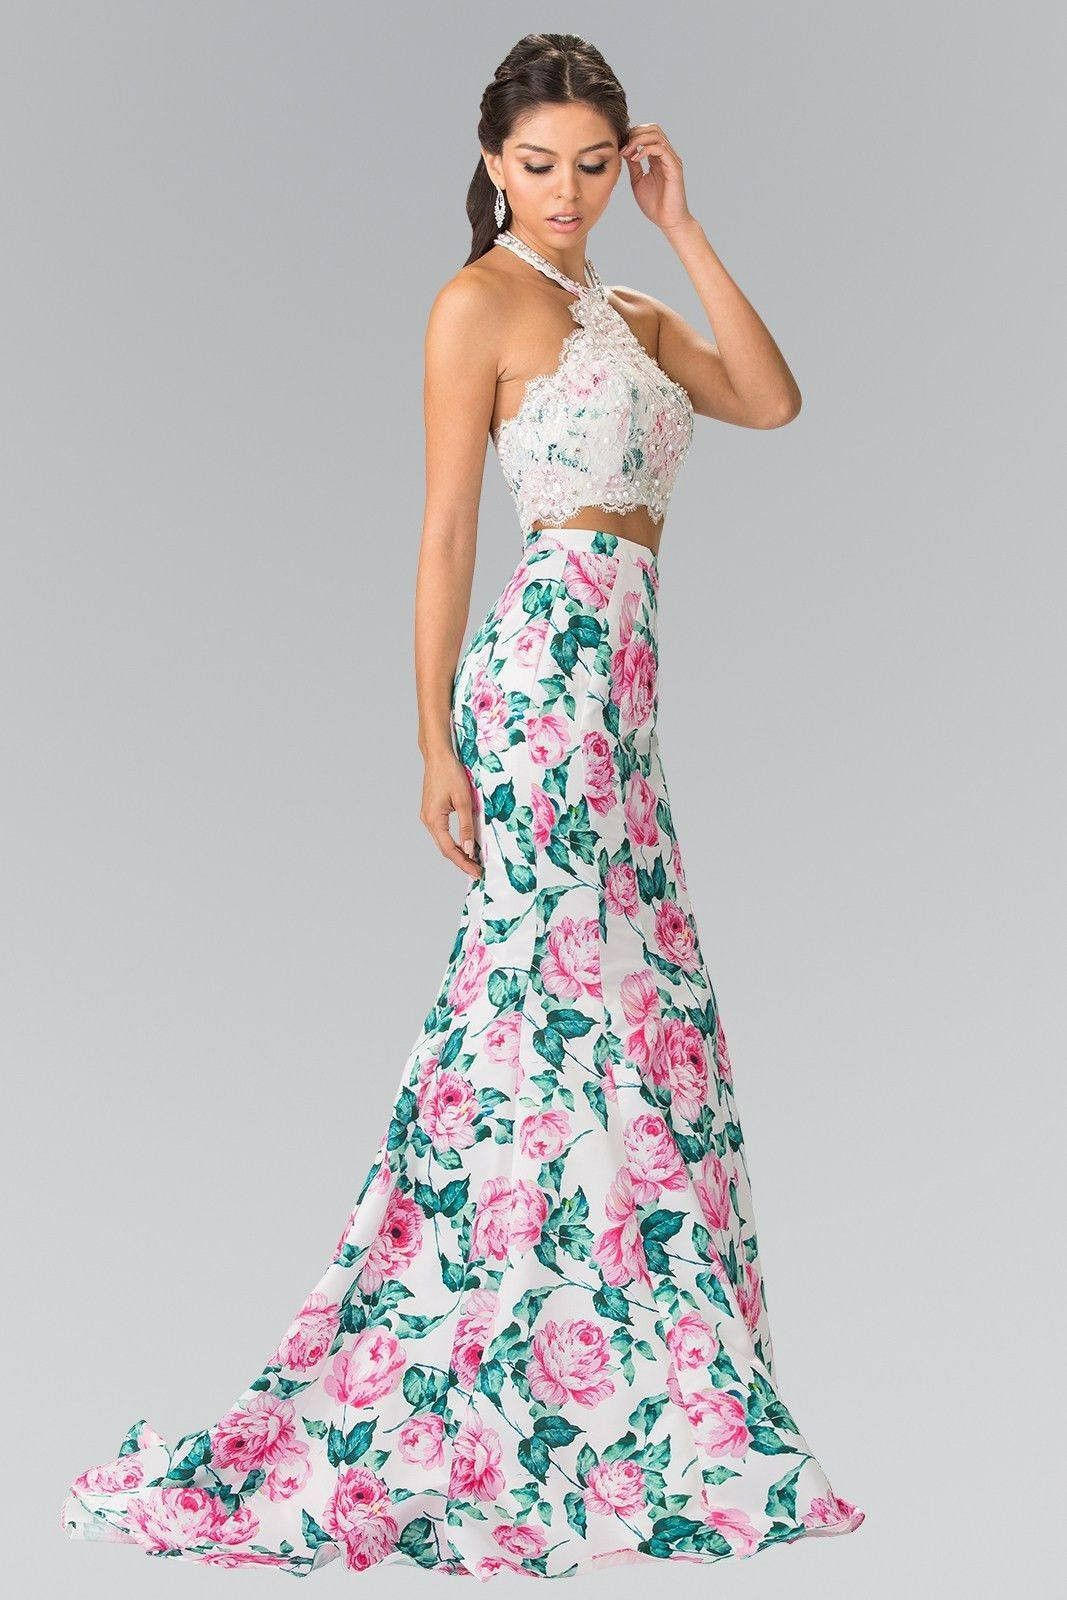 Cheap 2 piece floral Mermaid prom dress   GL2259 4abbd9d6e